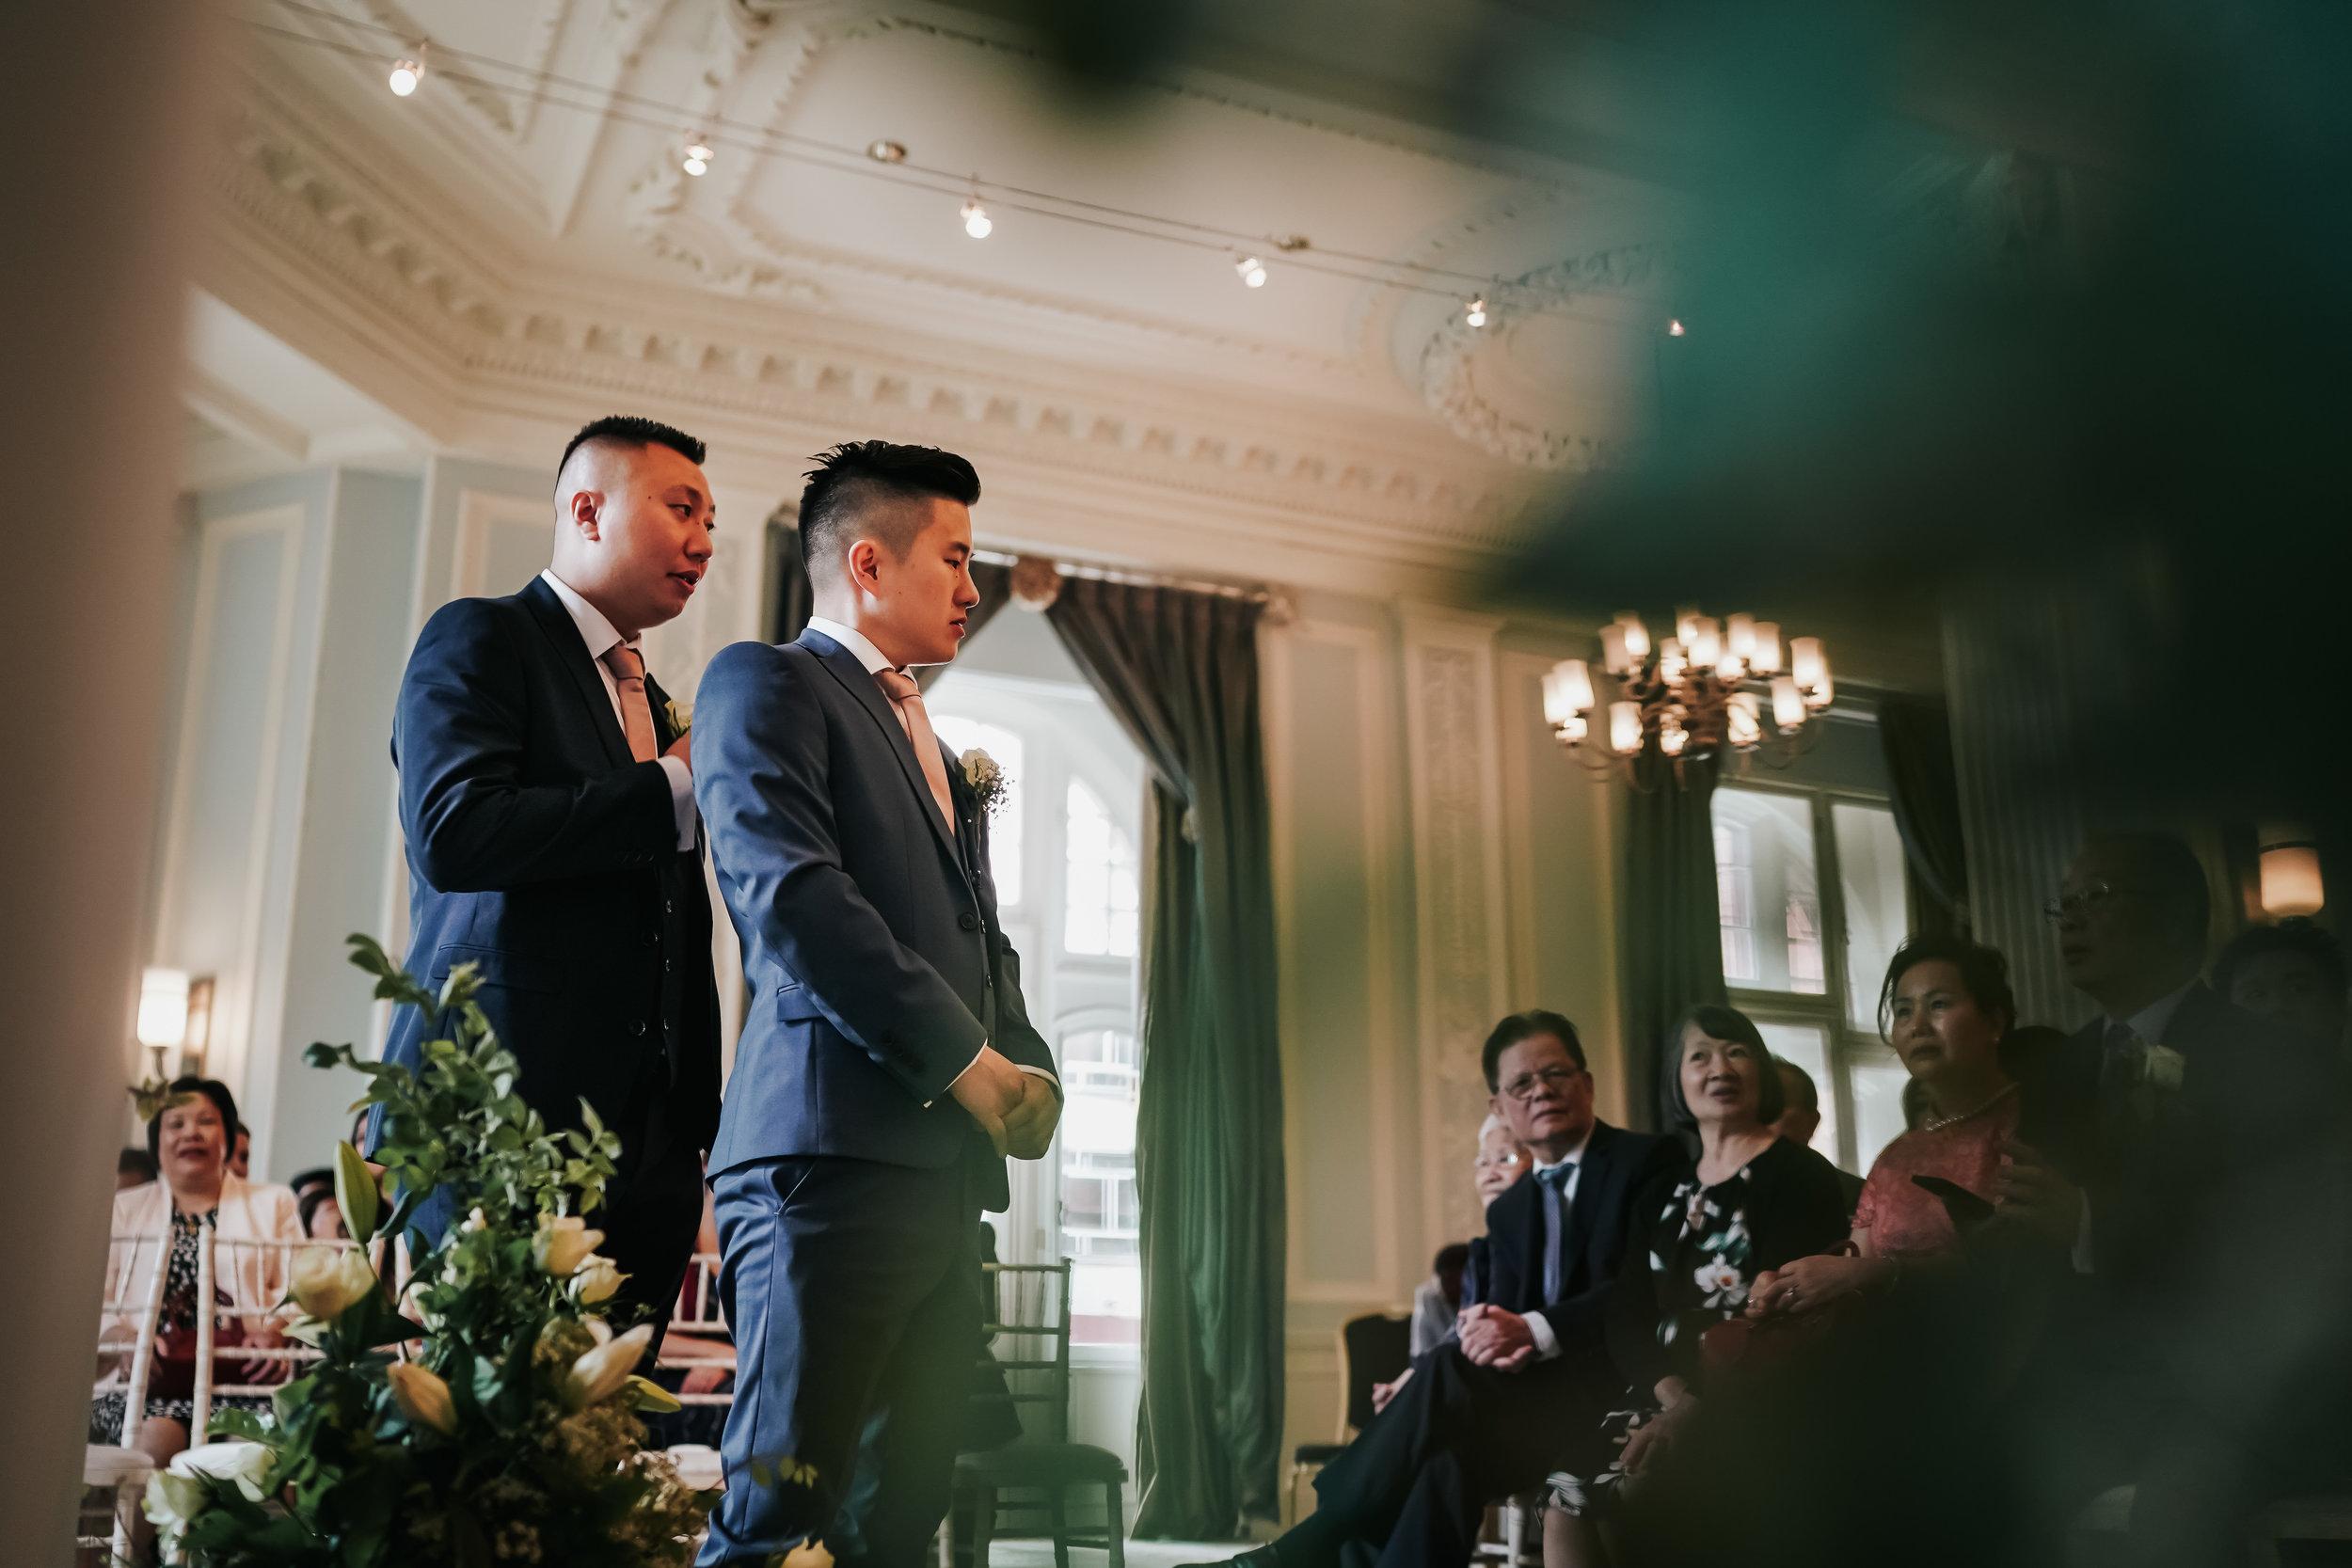 Chinese Wedding Photography Manchester wedding photographer Cheshire - 015.jpg